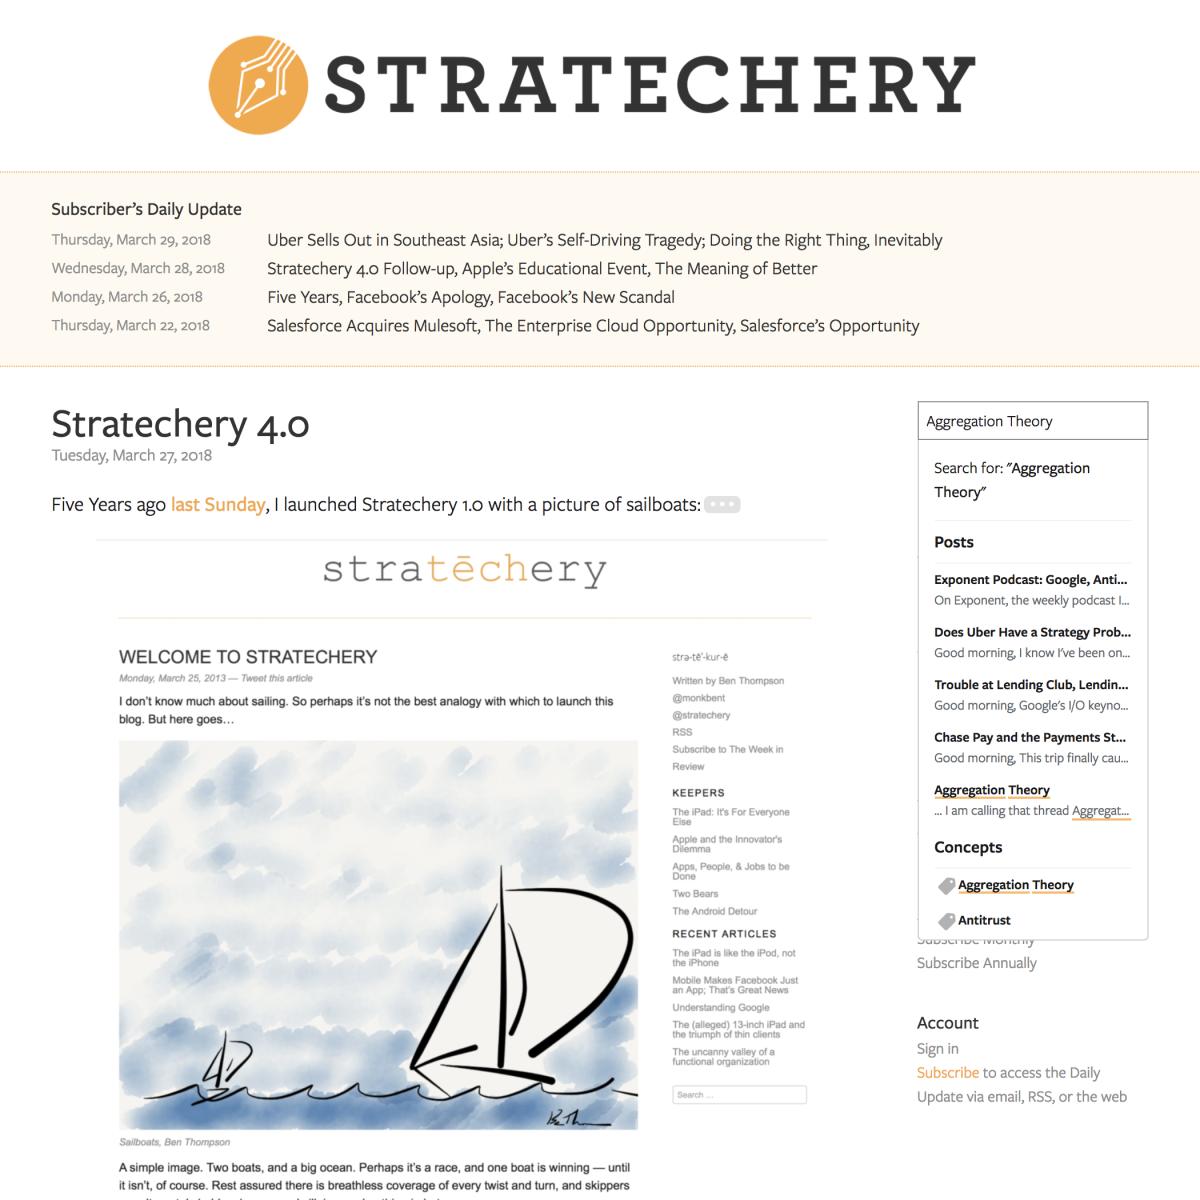 Stratechery 4.0: Not Just Another WordPressSite